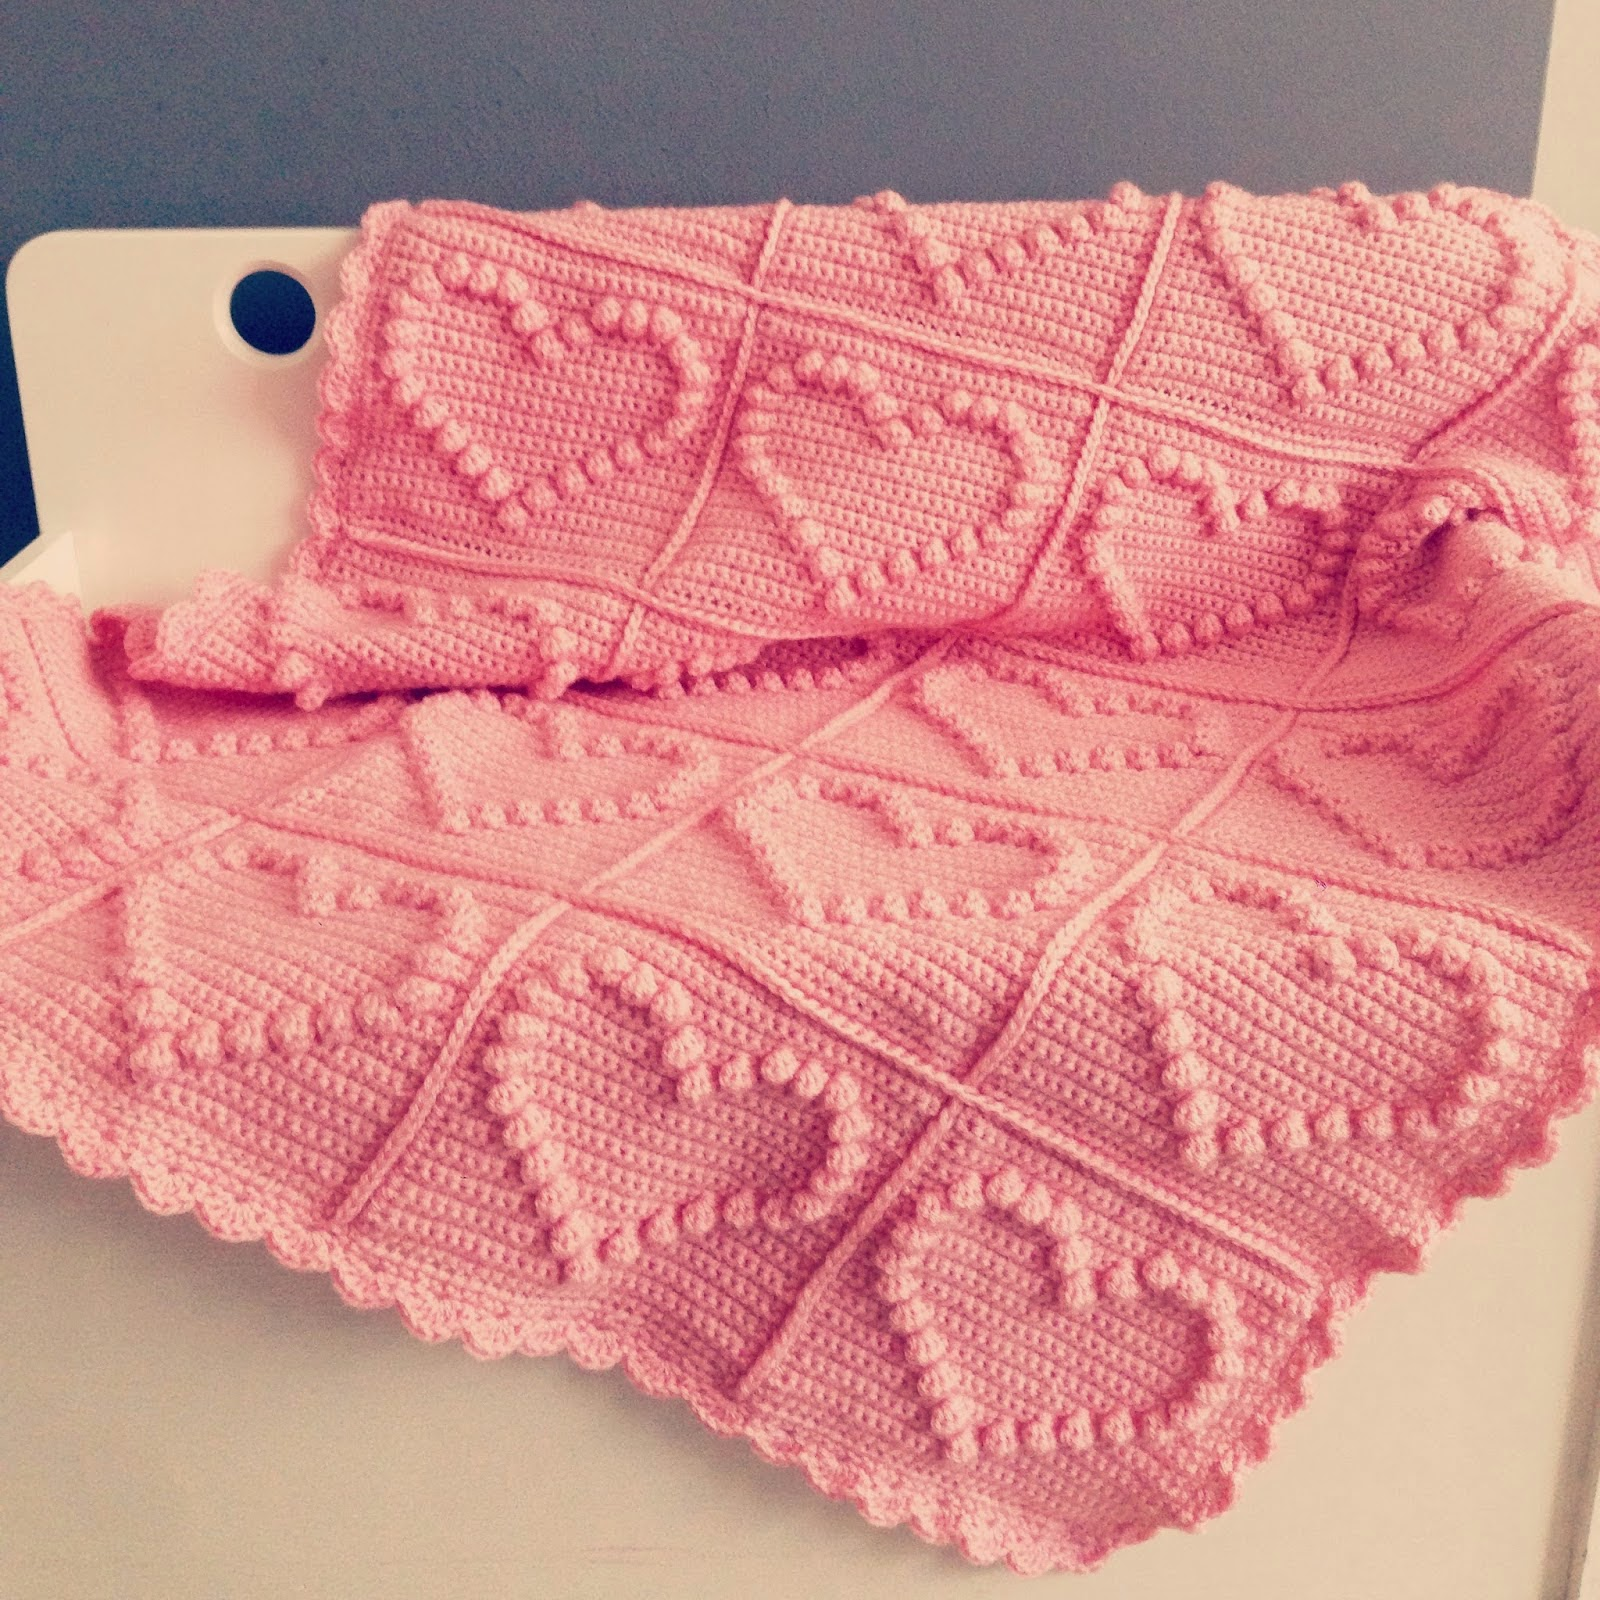 Crochet Granny Square Baby Afghan Patterns : Haaktips: Deken met hartjes